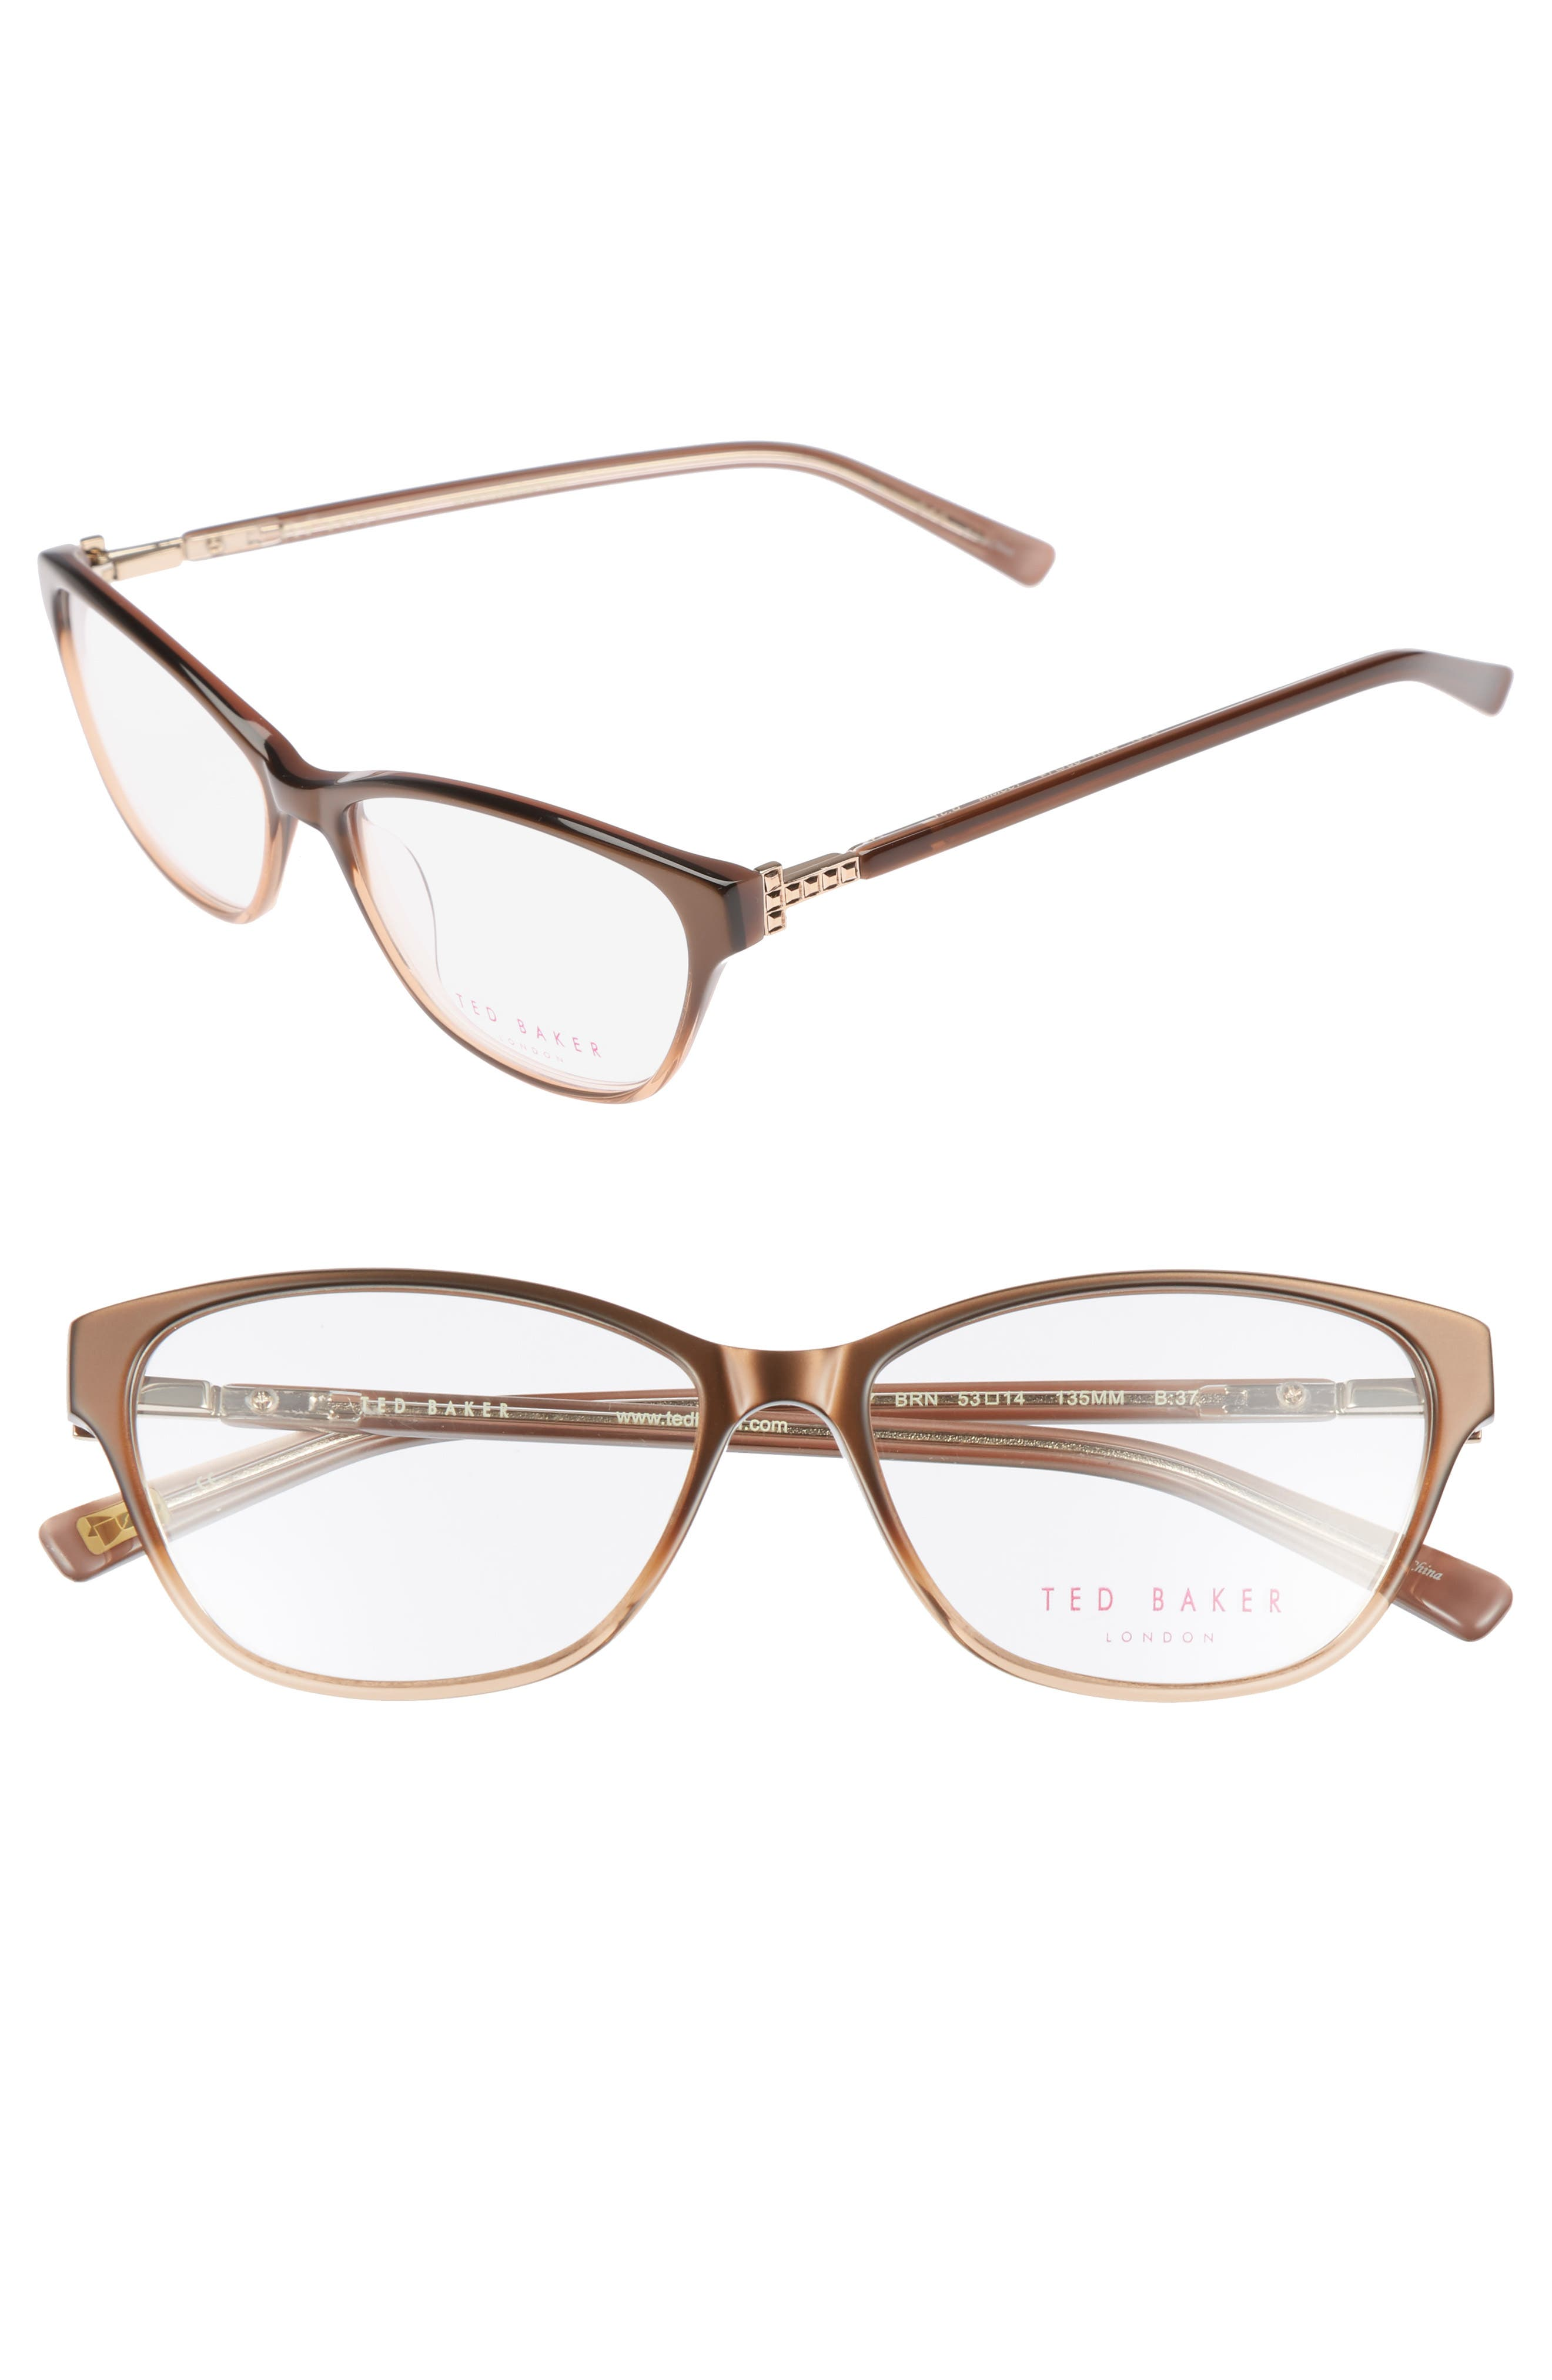 53mm Optical Cat Eye Glasses,                         Main,                         color, 200